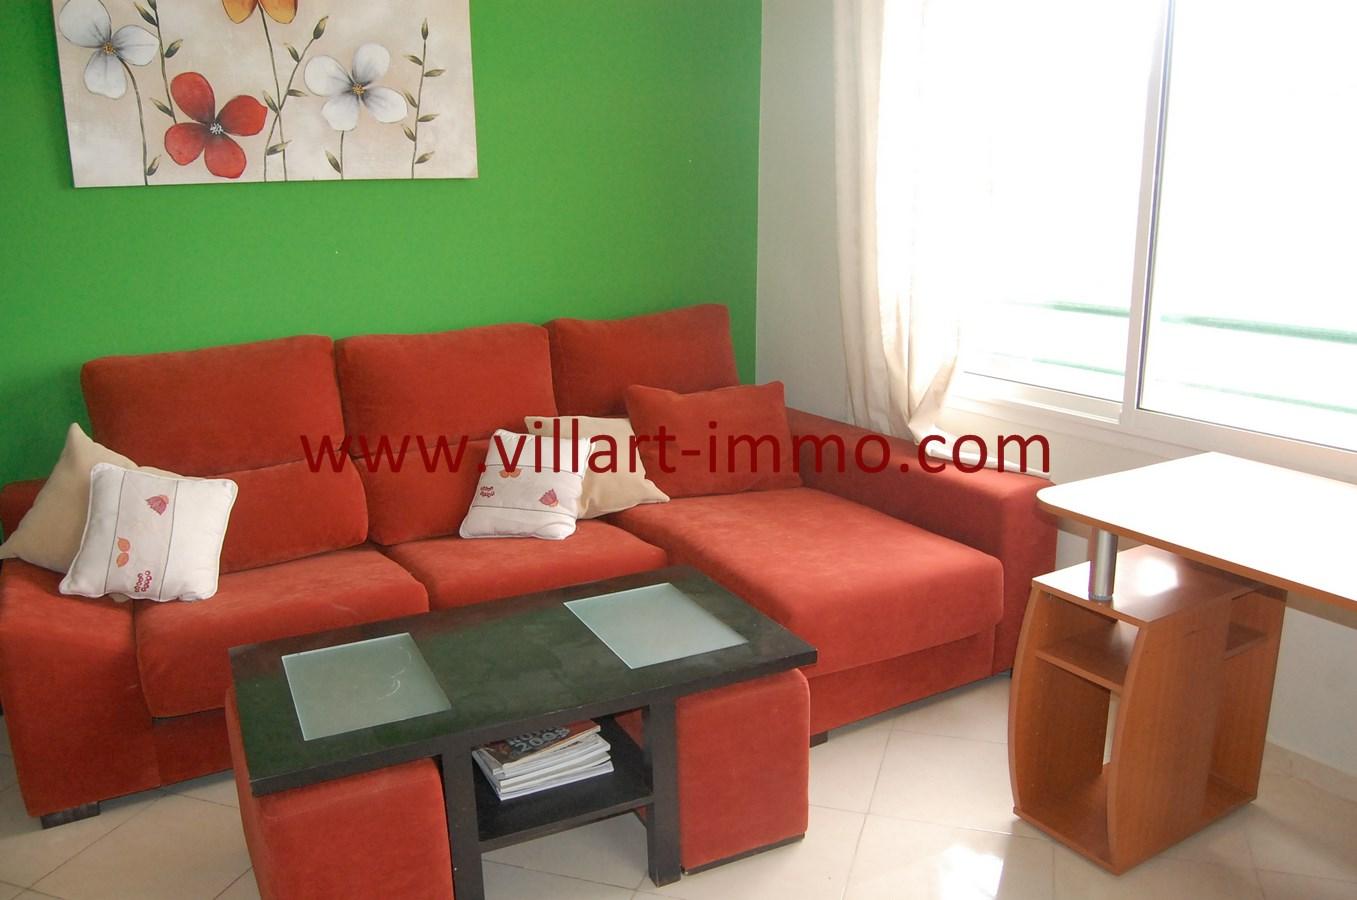 5-Vente-Appartement-Tanger-Chambre 2-VA480-Villart Immo